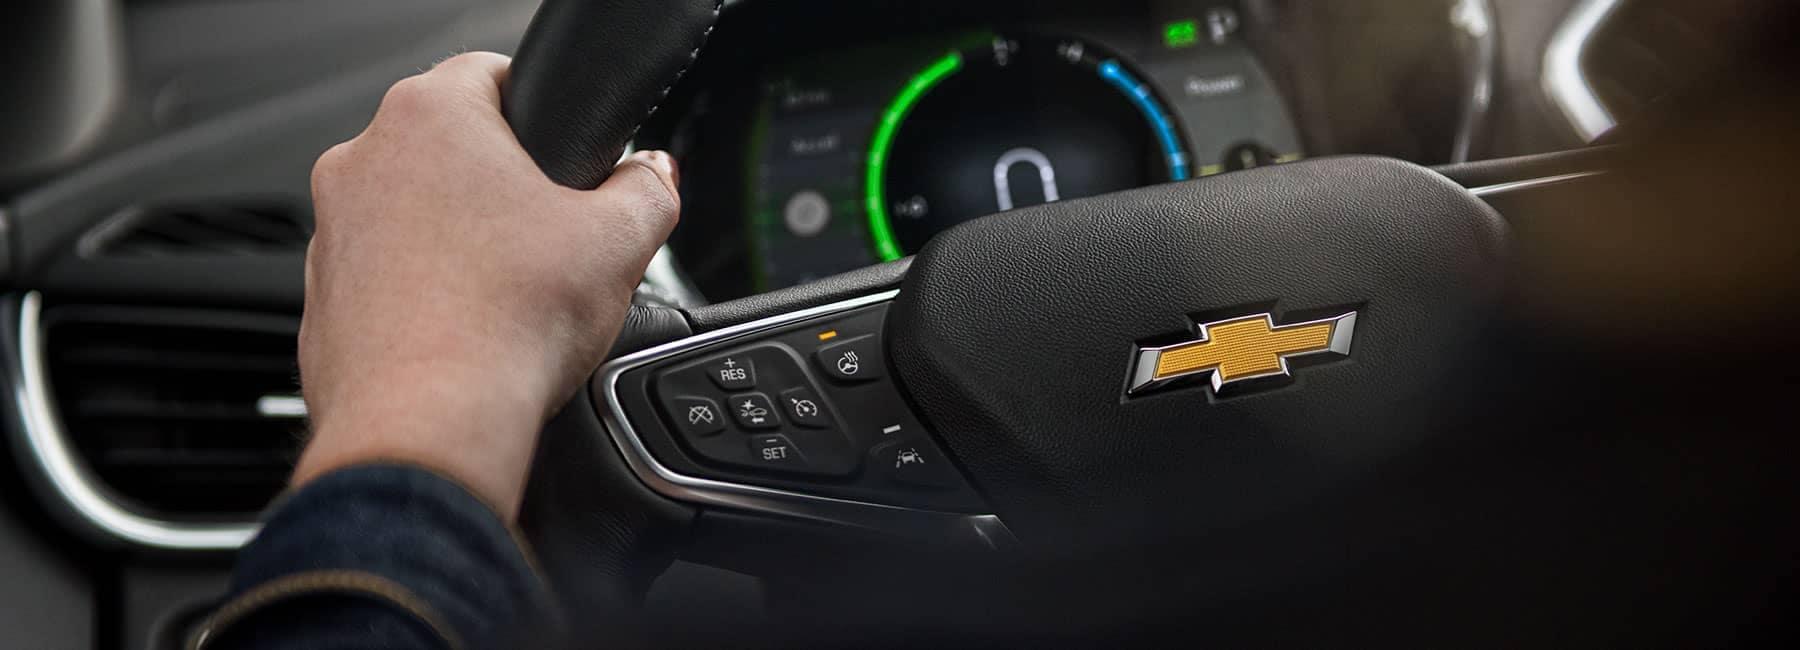 Chevrolet steering wheel